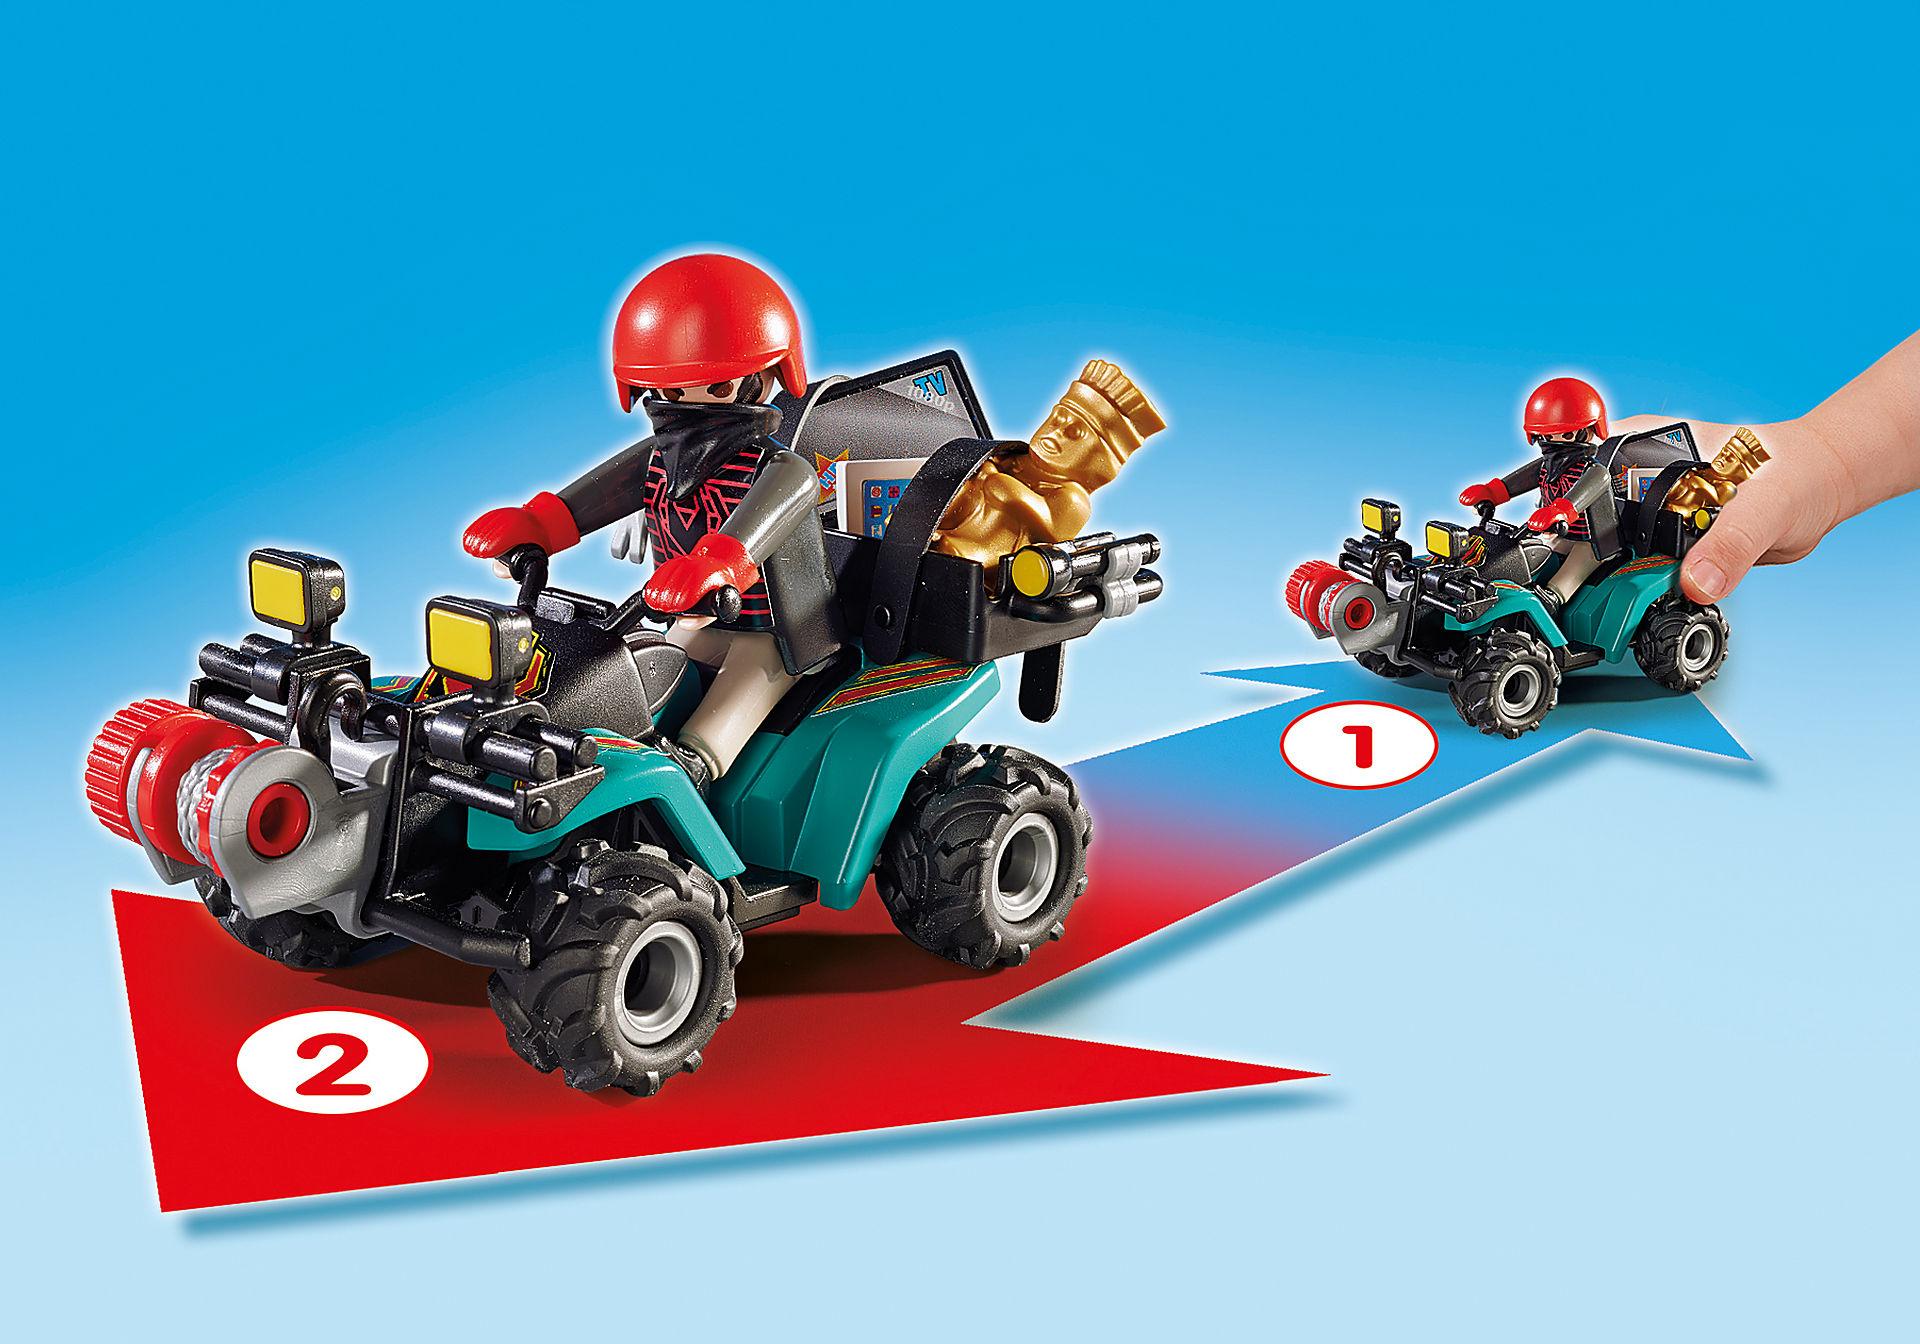 http://media.playmobil.com/i/playmobil/6879_product_extra1/Ladrón con Quad y Botín